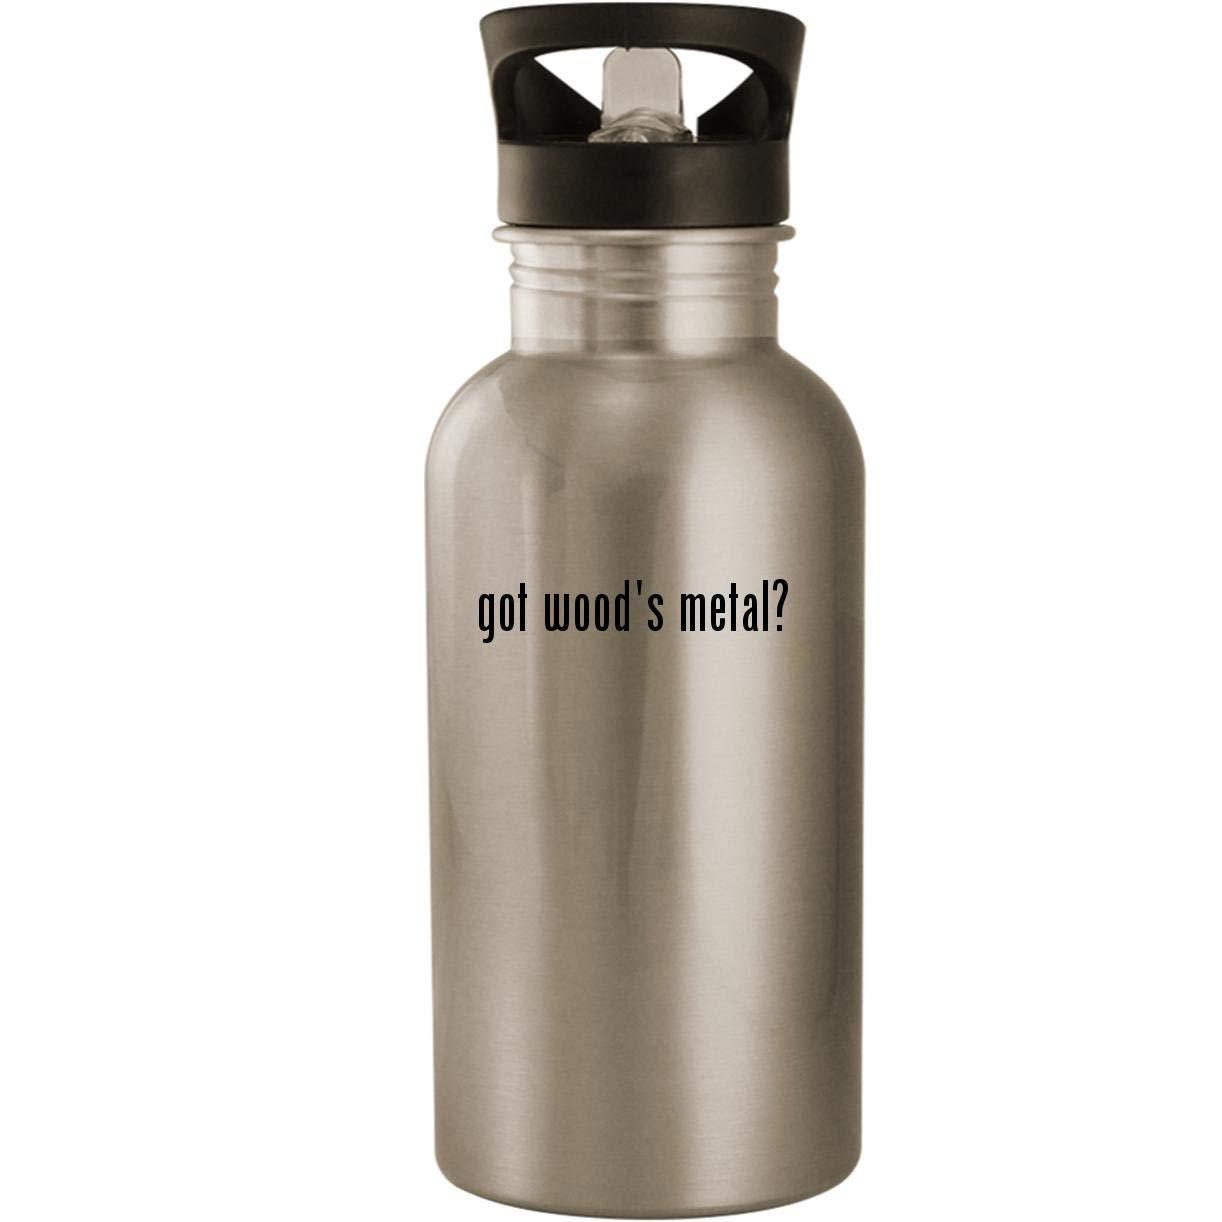 got wood's metal? - Stainless Steel 20oz Road Ready Water Bottle, Silver